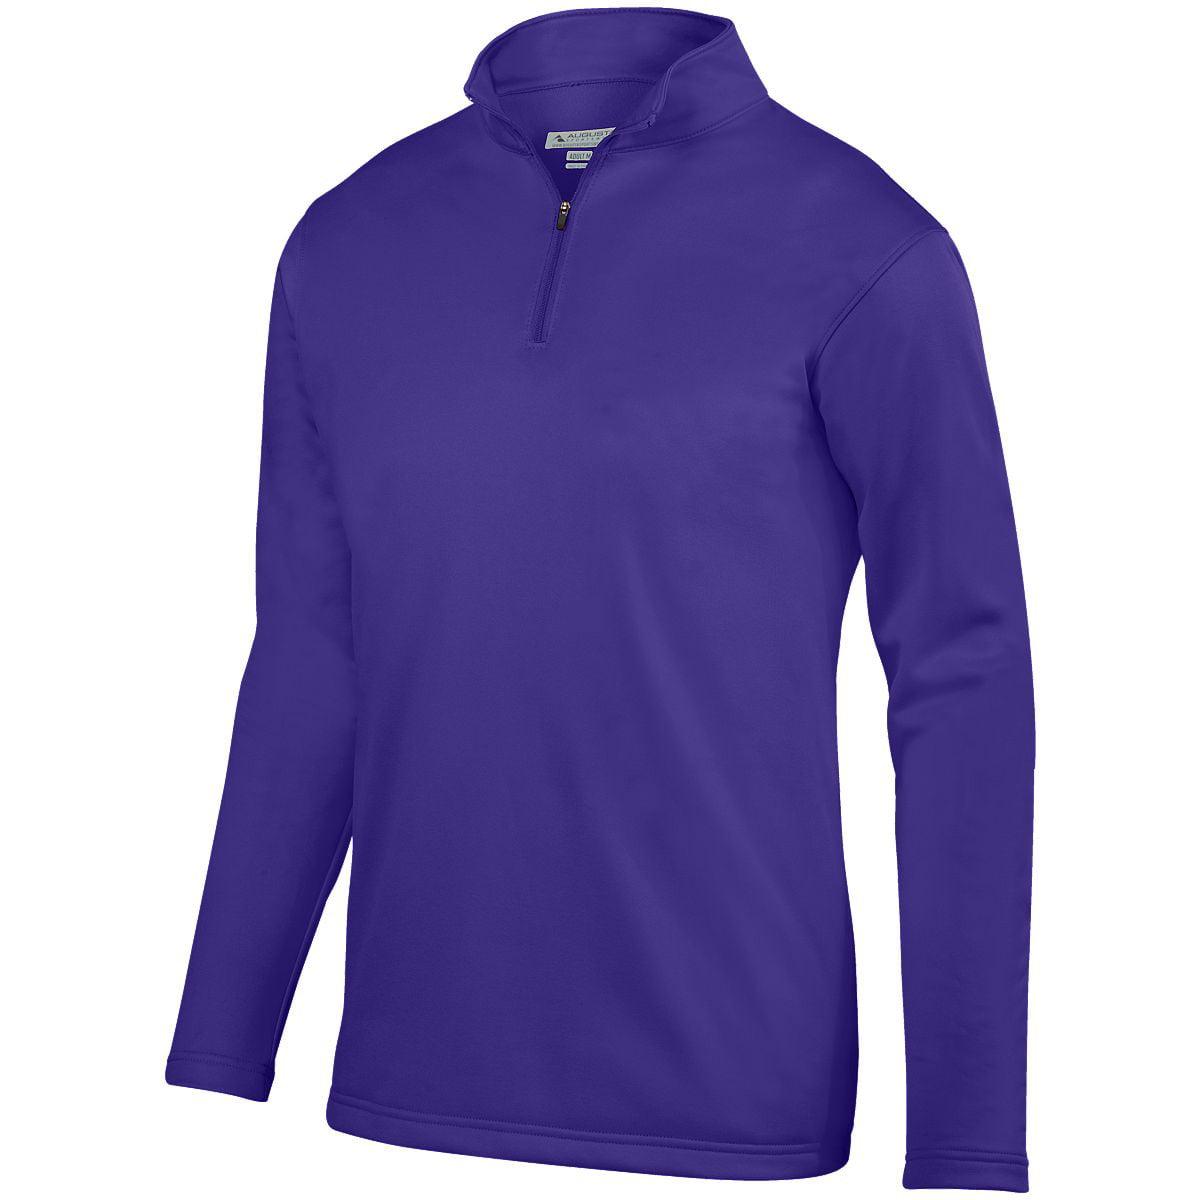 Augusta Wicking Fleece Pullover Purple 2Xl - image 1 de 1